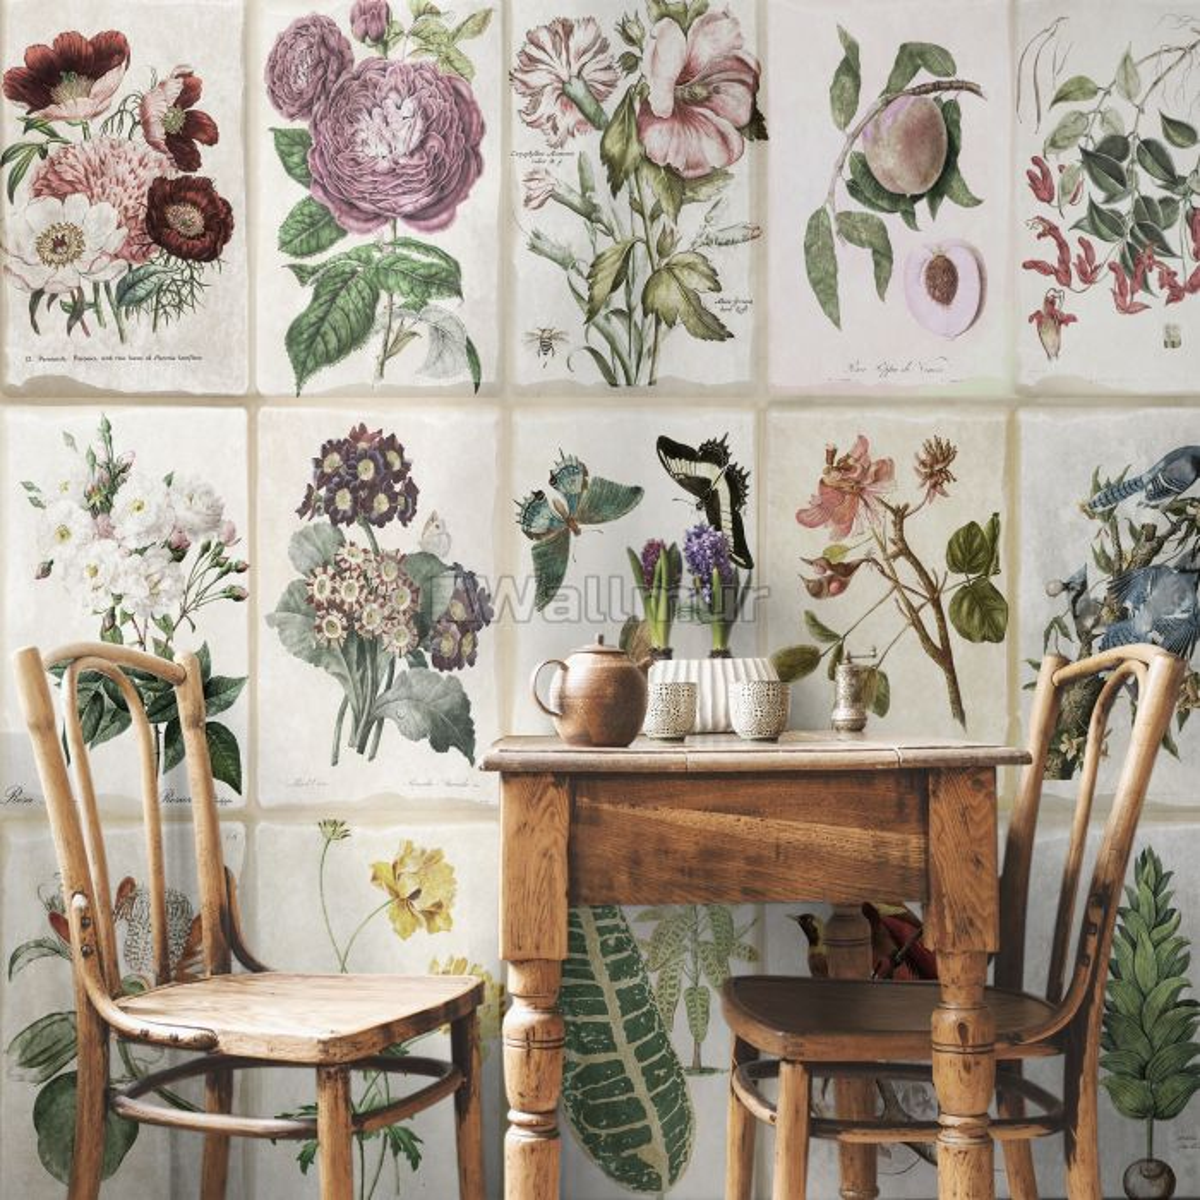 Vintage Floral Ceramic Art Wallpaper Mural